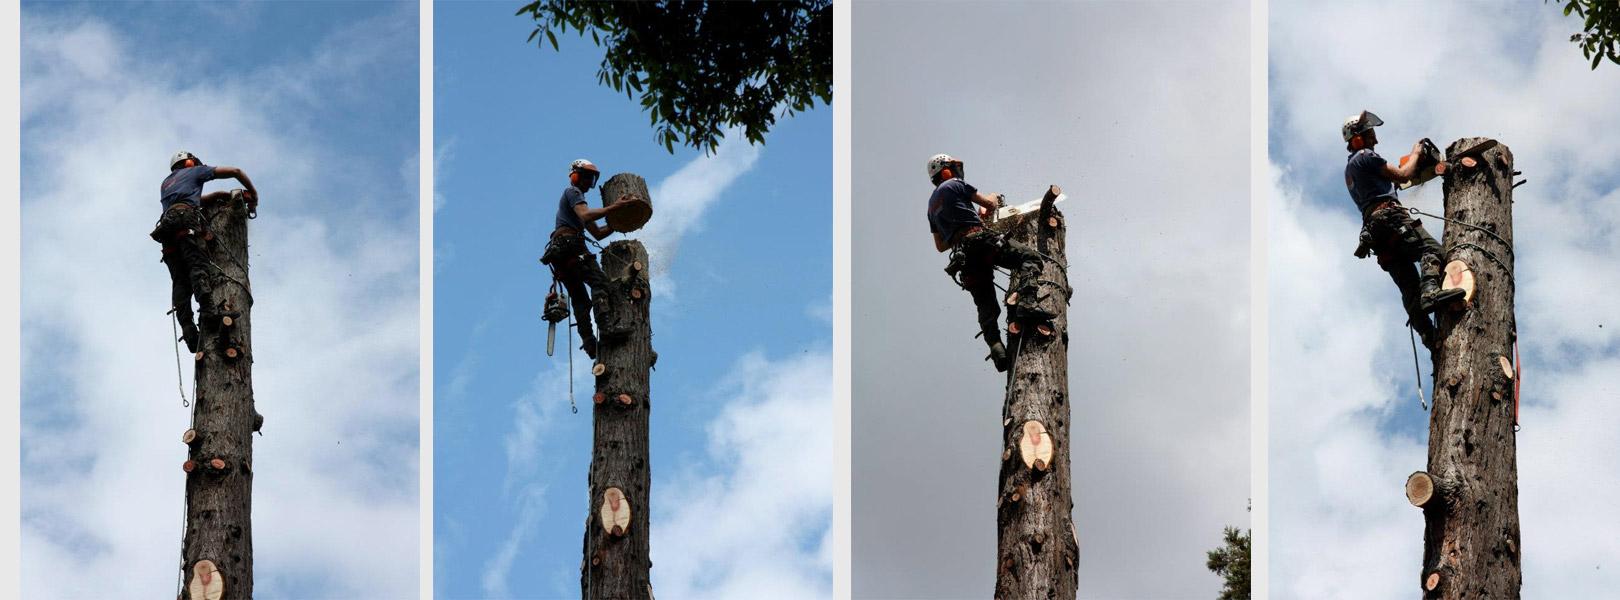 Tree Services Company In Dublin Abatis Dublin Tree Surgeon